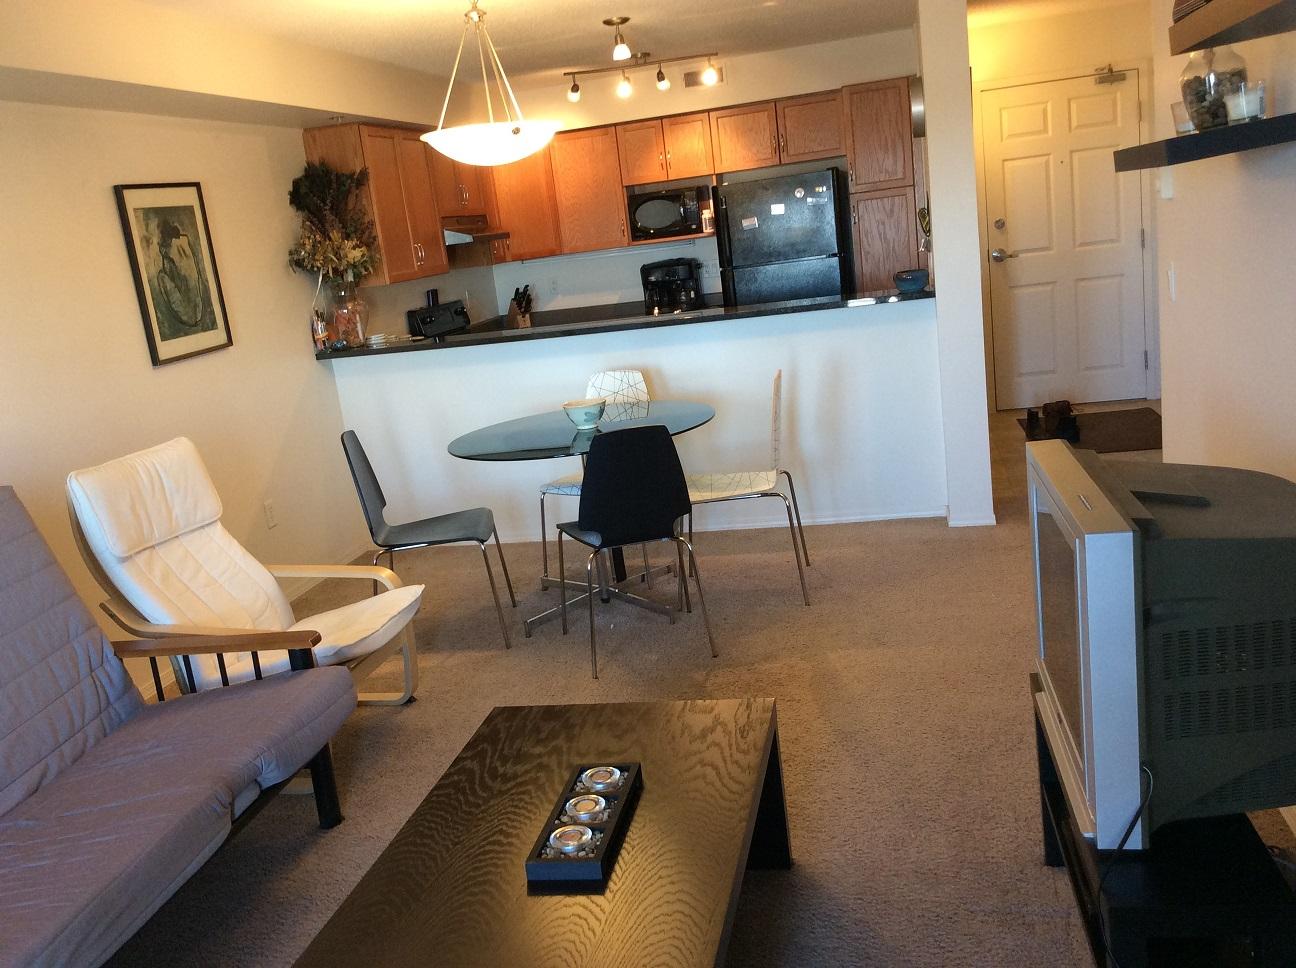 408-240 Fairhaven Rd.,Winnipeg,Manitoba,2 Bedrooms Bedrooms,1 BathroomBathrooms,Condo,Fairhaven Rd.,1123